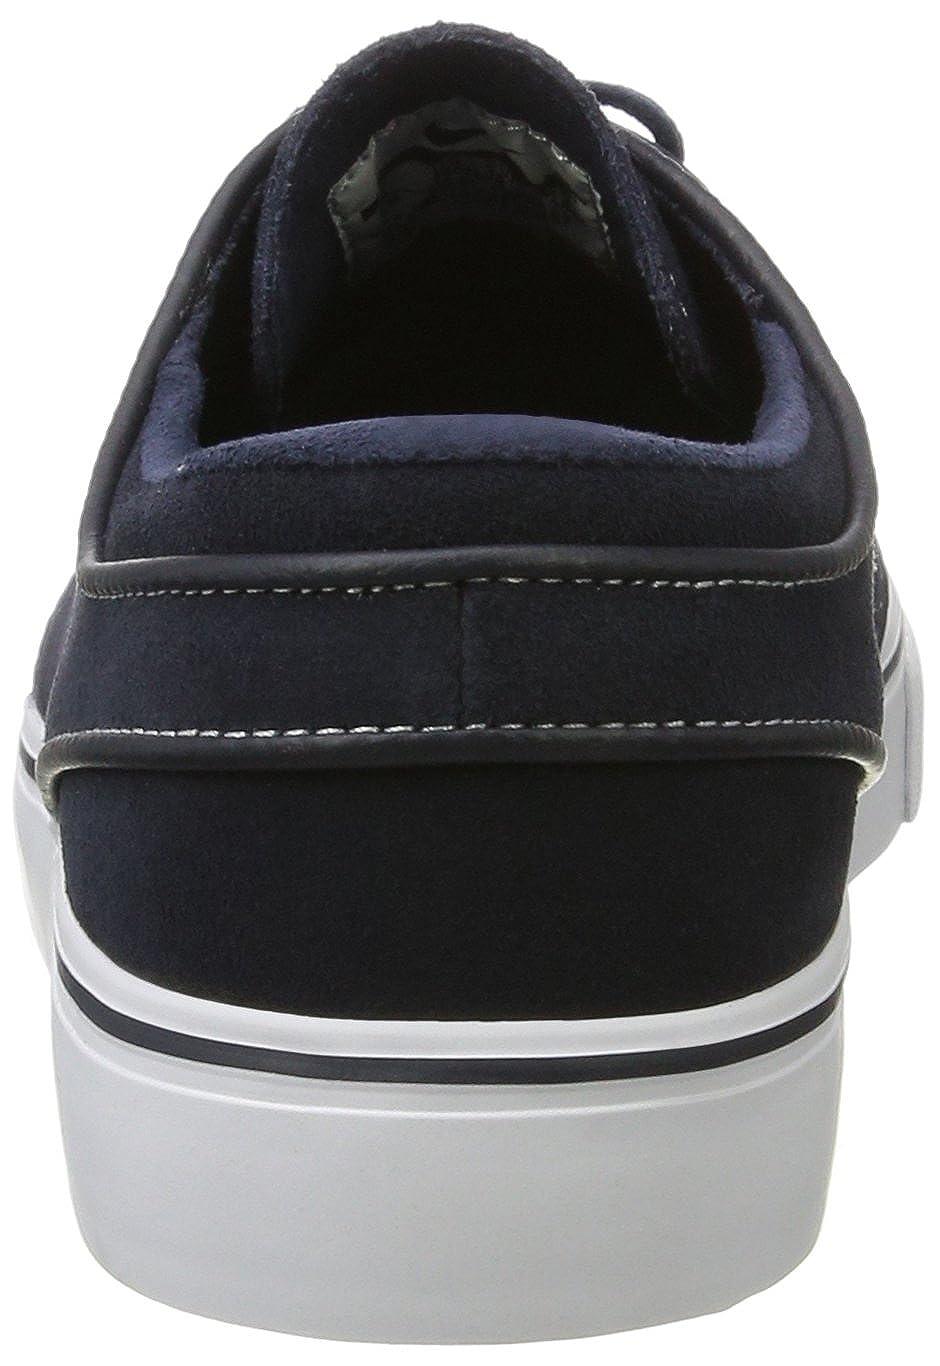 huge discount 6c7df f4d55 Nike Men s Zoom Stefan Janoski Skateboarding Shoes, Blue (Dark Obsidian  White), 6 UK (39 EU)  Amazon.co.uk  Shoes   Bags